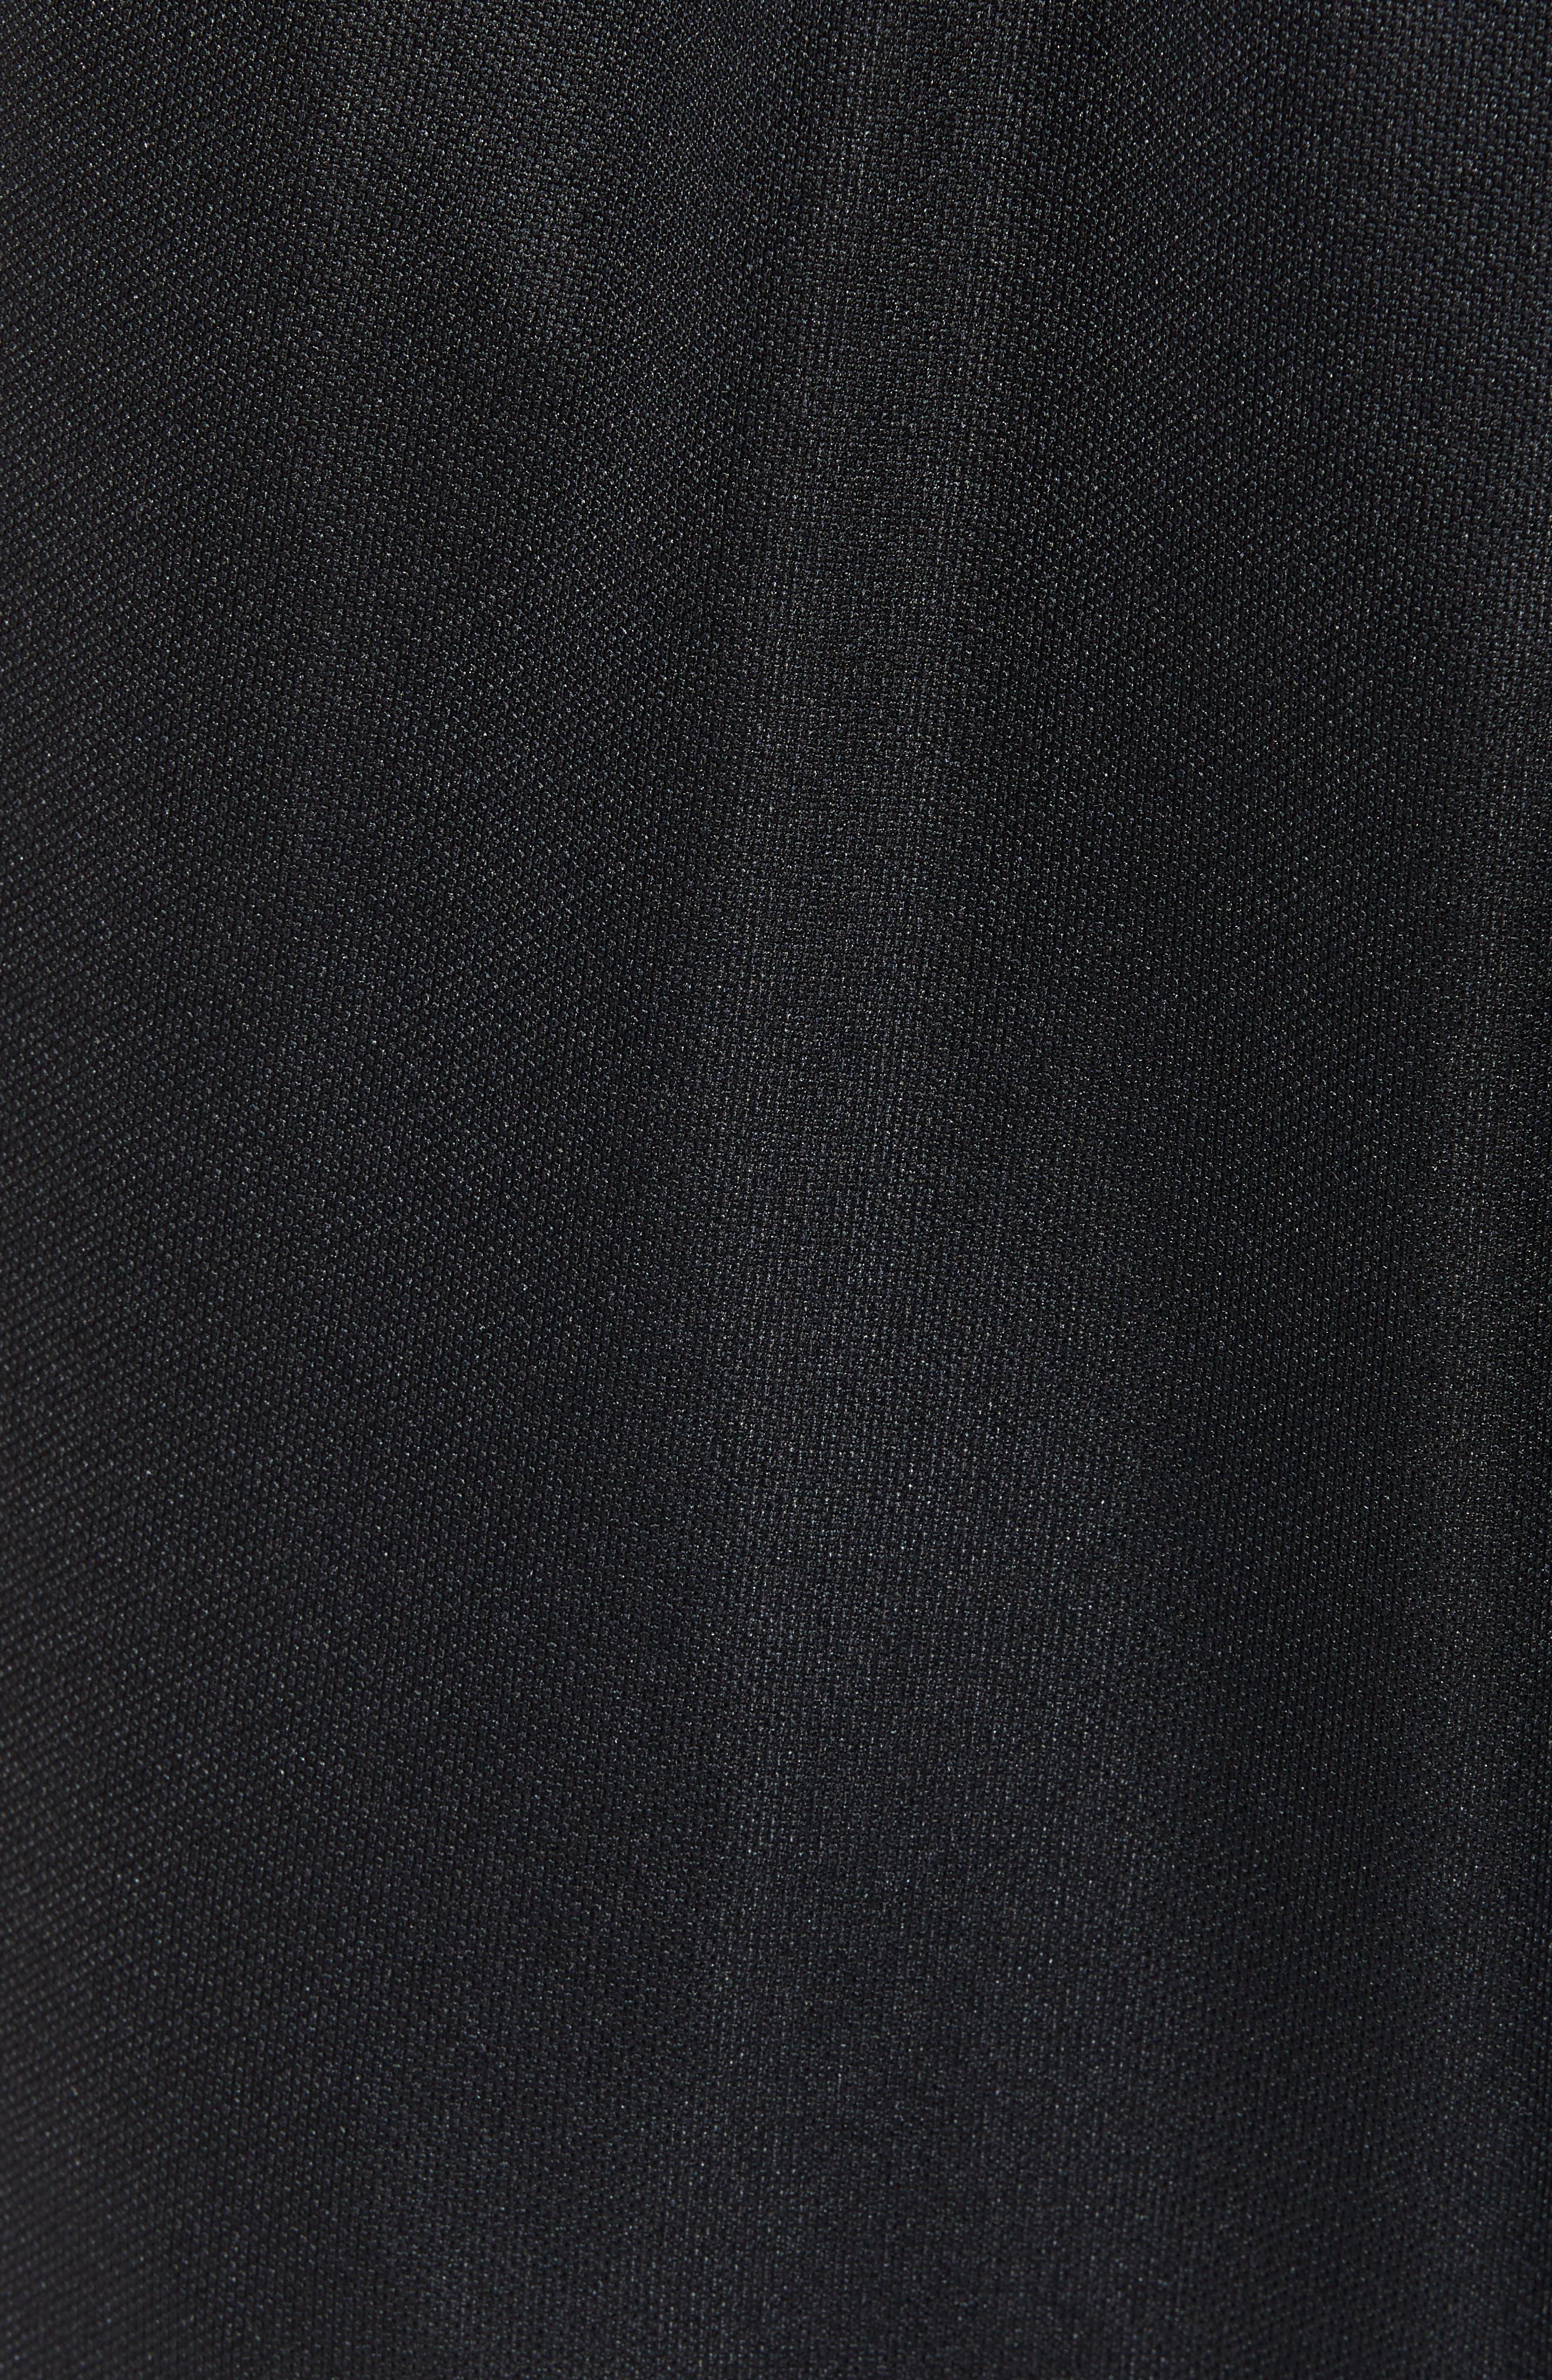 ADIDAS, Tiro Soccer Training Pants, Alternate thumbnail 6, color, BLACK/ WHITE